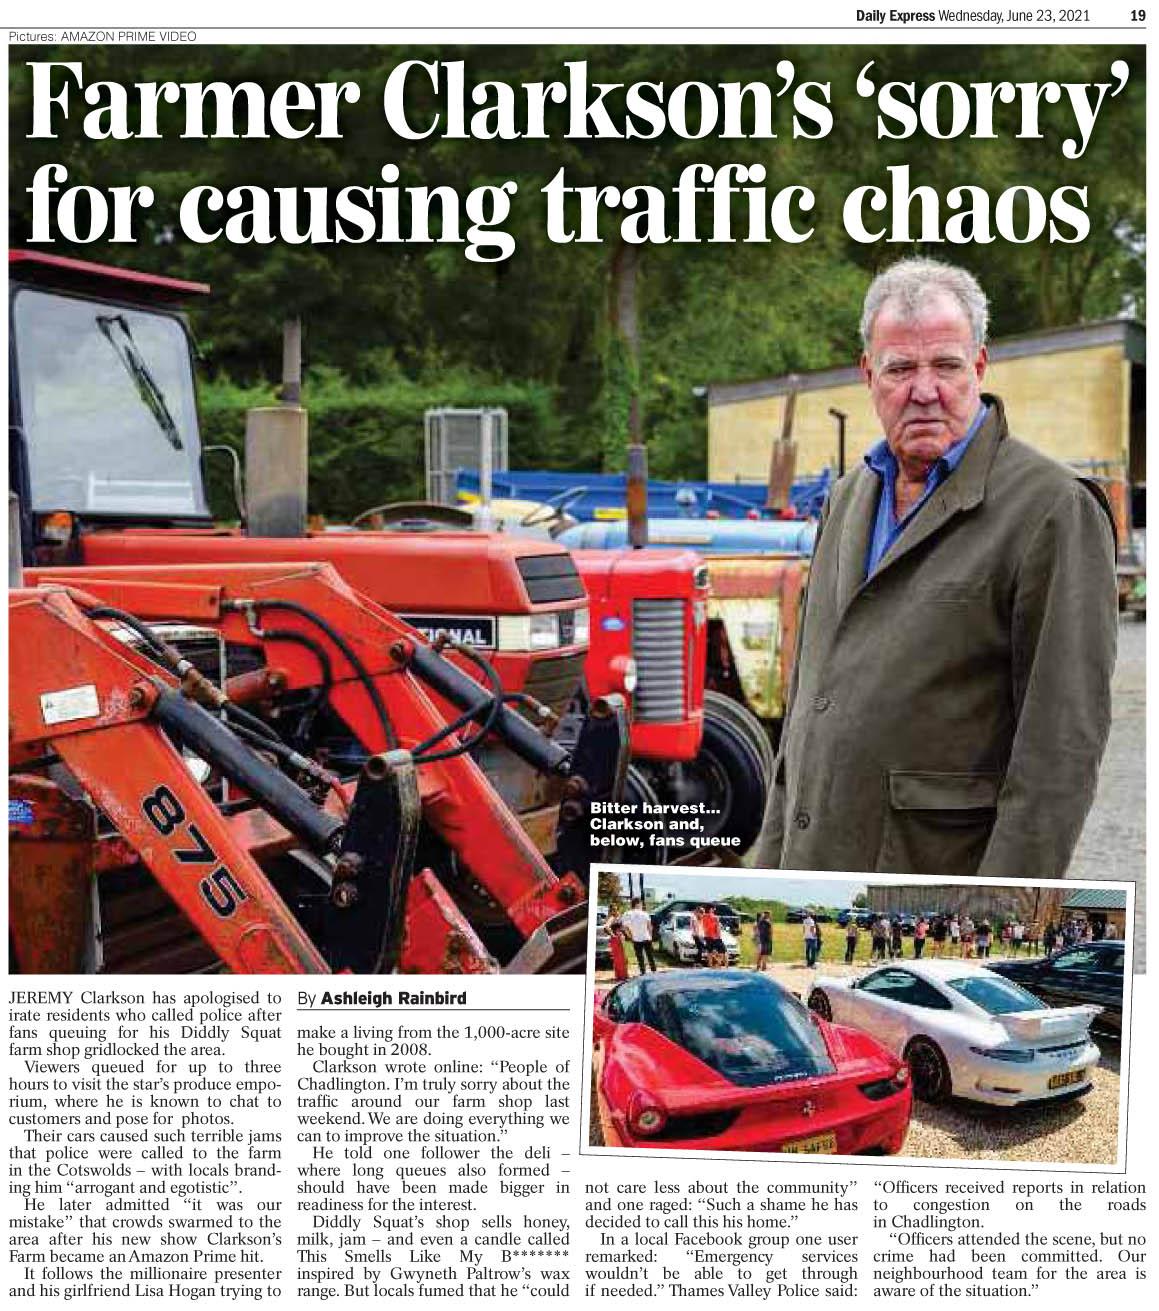 DExpress 210623 Clarkson.jpg